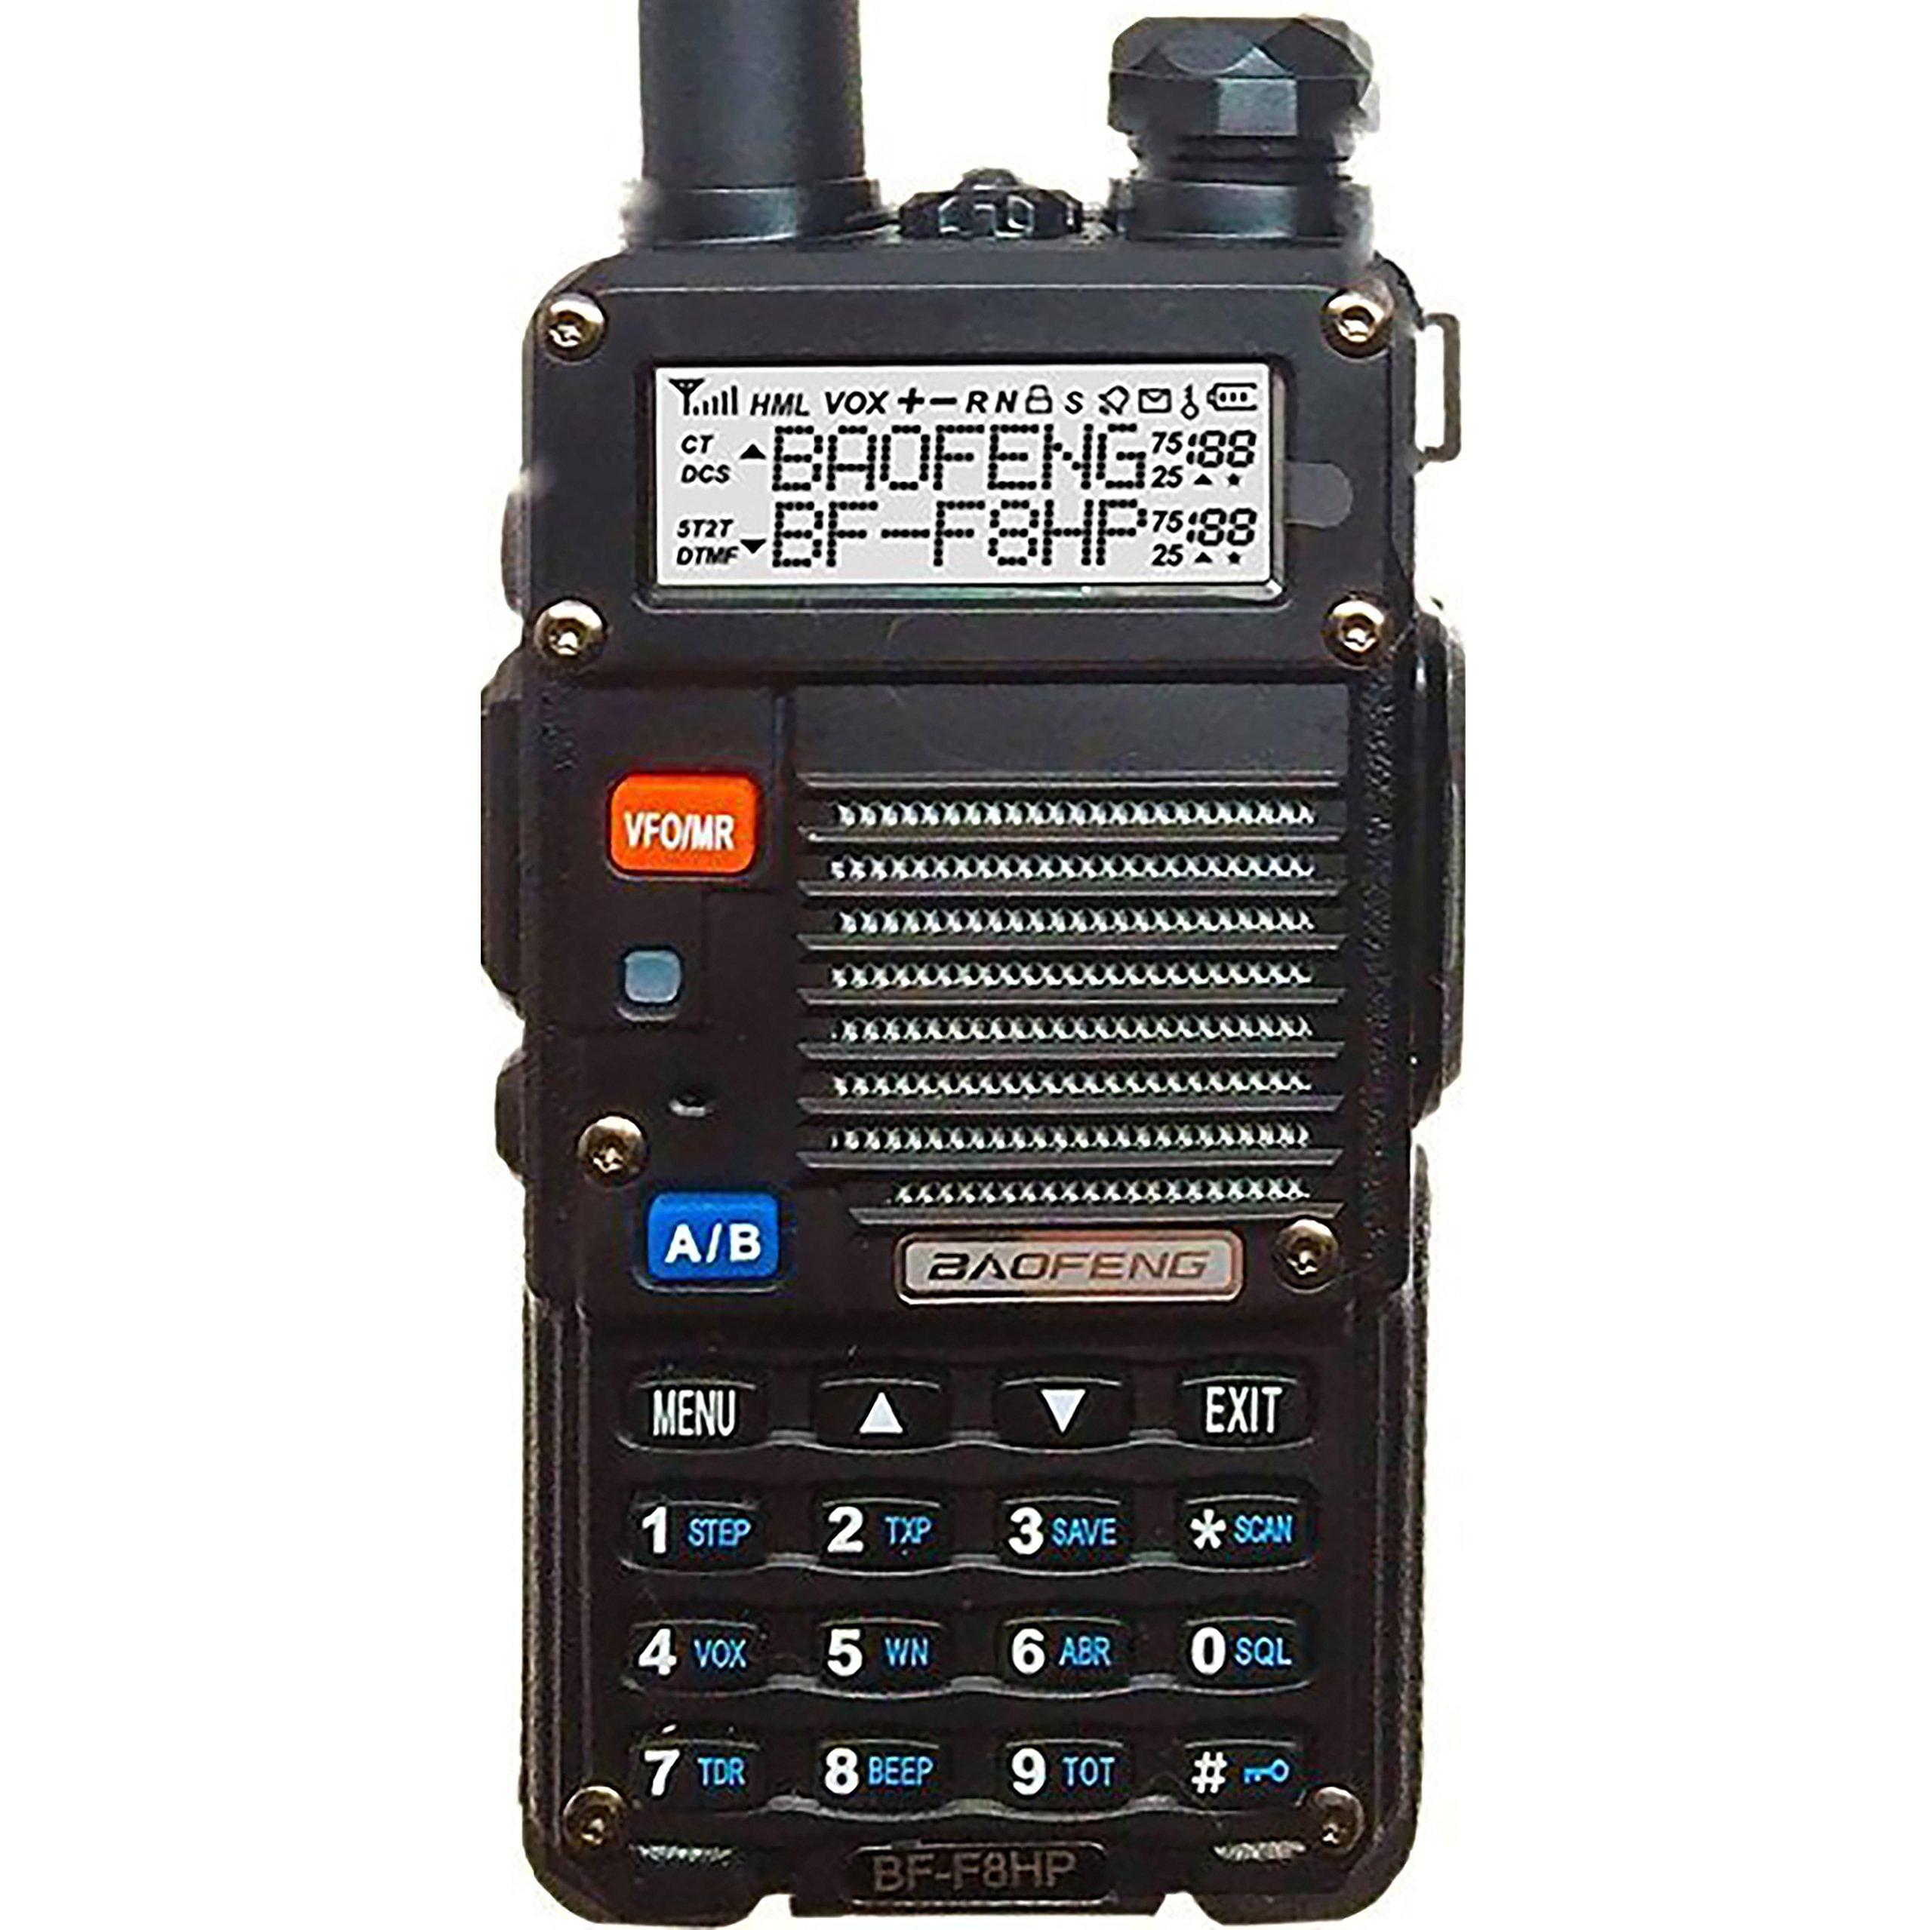 Baofeng BF-F8HP Walkie Talkie Dual Band VHF UHF Two Way Radio UV-5R 3rd Gen